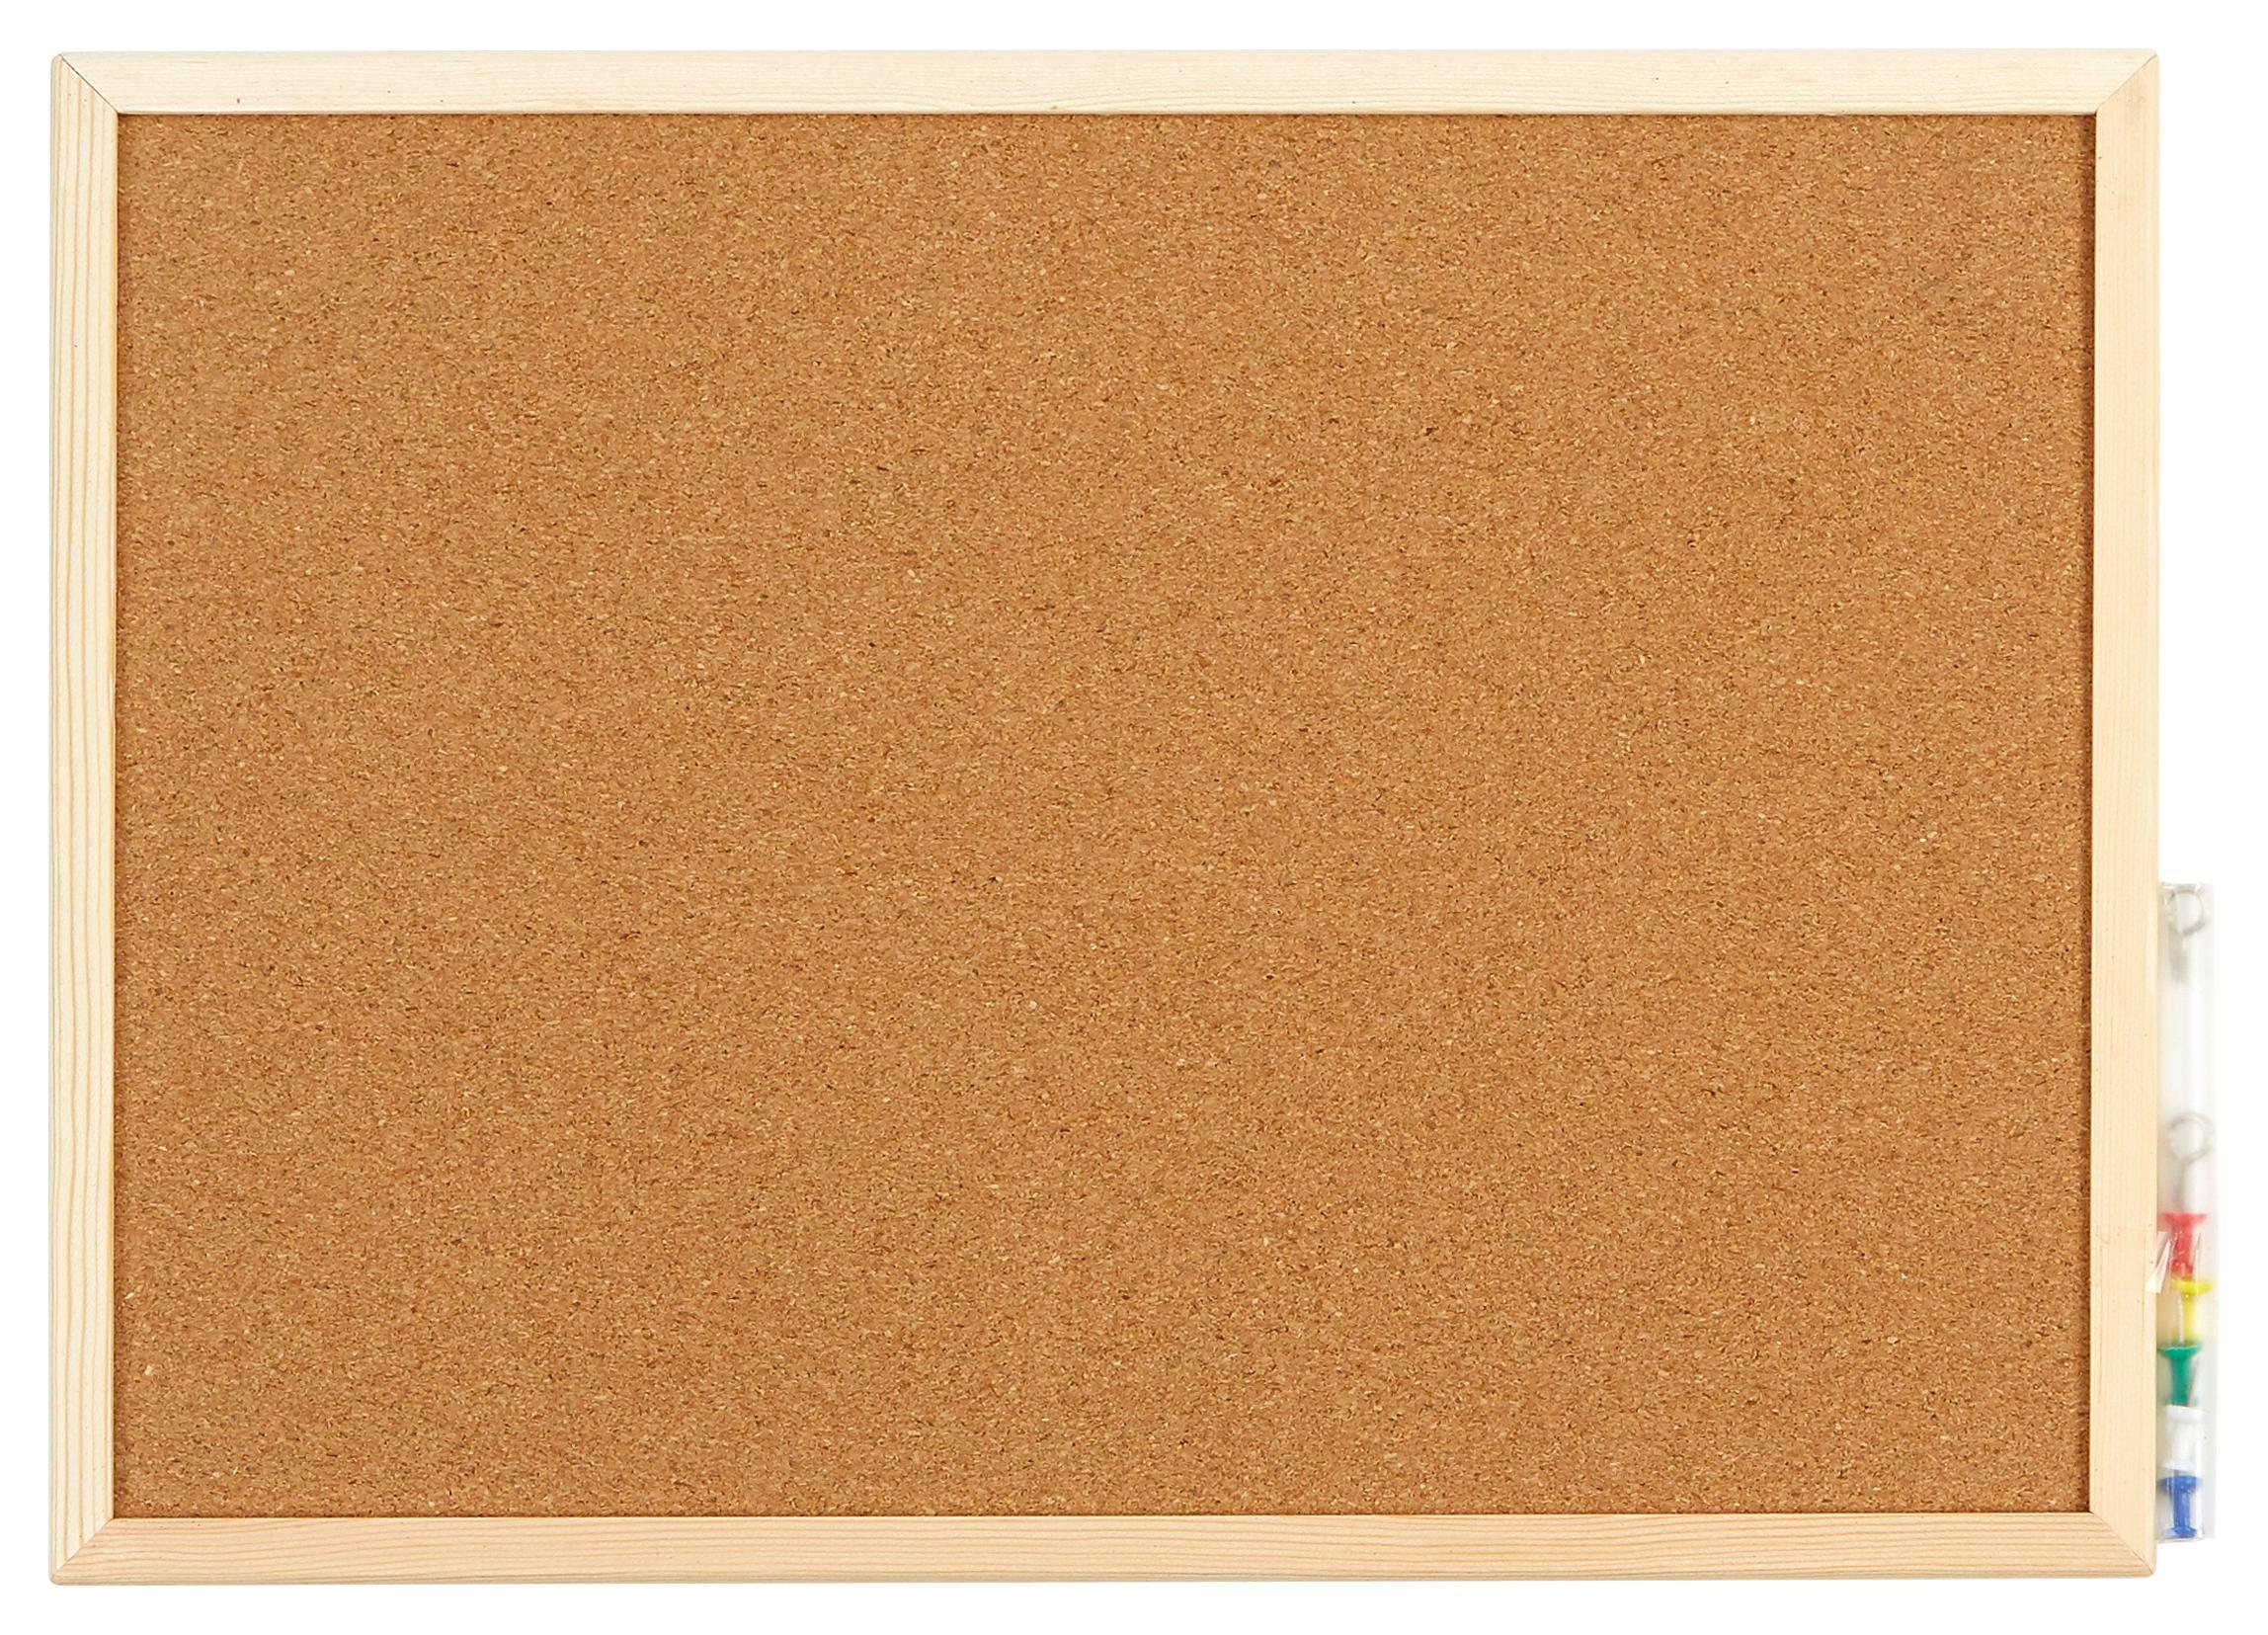 Üzenőtábla 166036 - barna, konvencionális, fa (30/40cm)